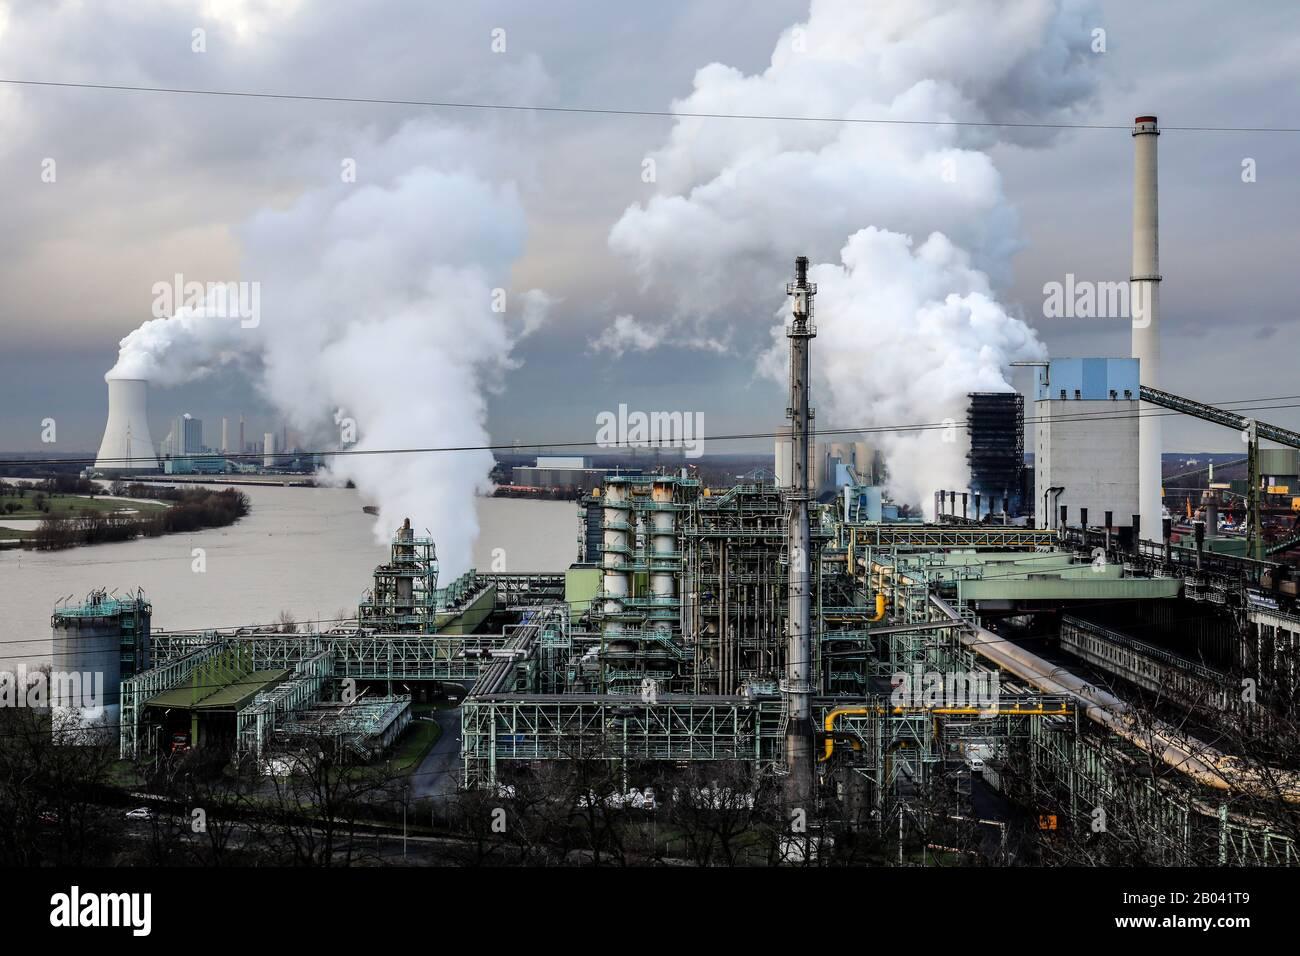 Duisburg, Ruhr Area, North Rhine-Westphalia, Germany - ThyssenKrupp Steel Europe, KBS coking plant Schwelgern am Rhein in Duisburg-Marxloh, at the bac Stock Photo